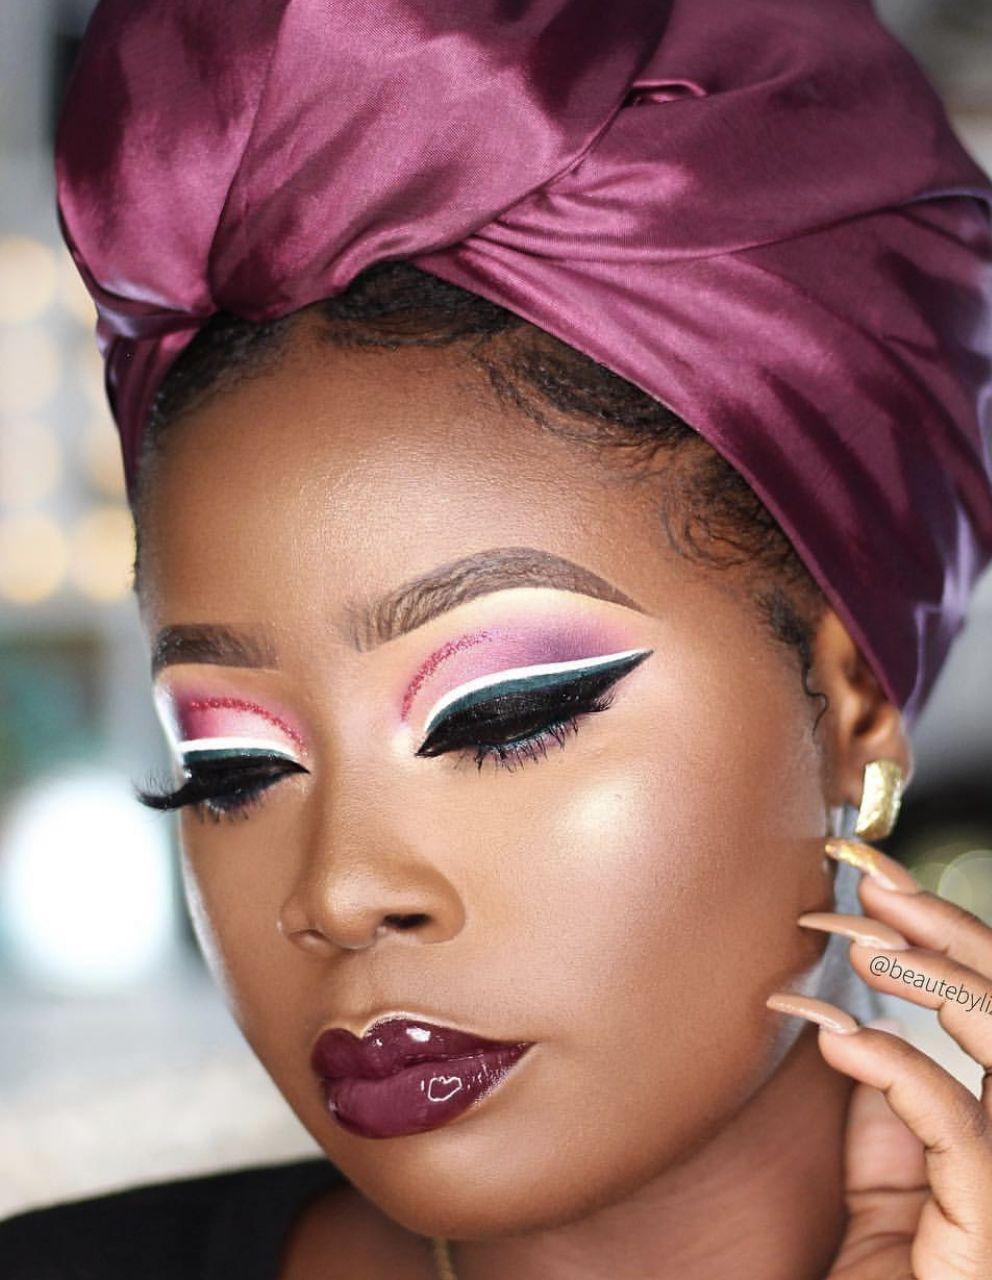 Makeup for black women Makeup for black women, Makeup